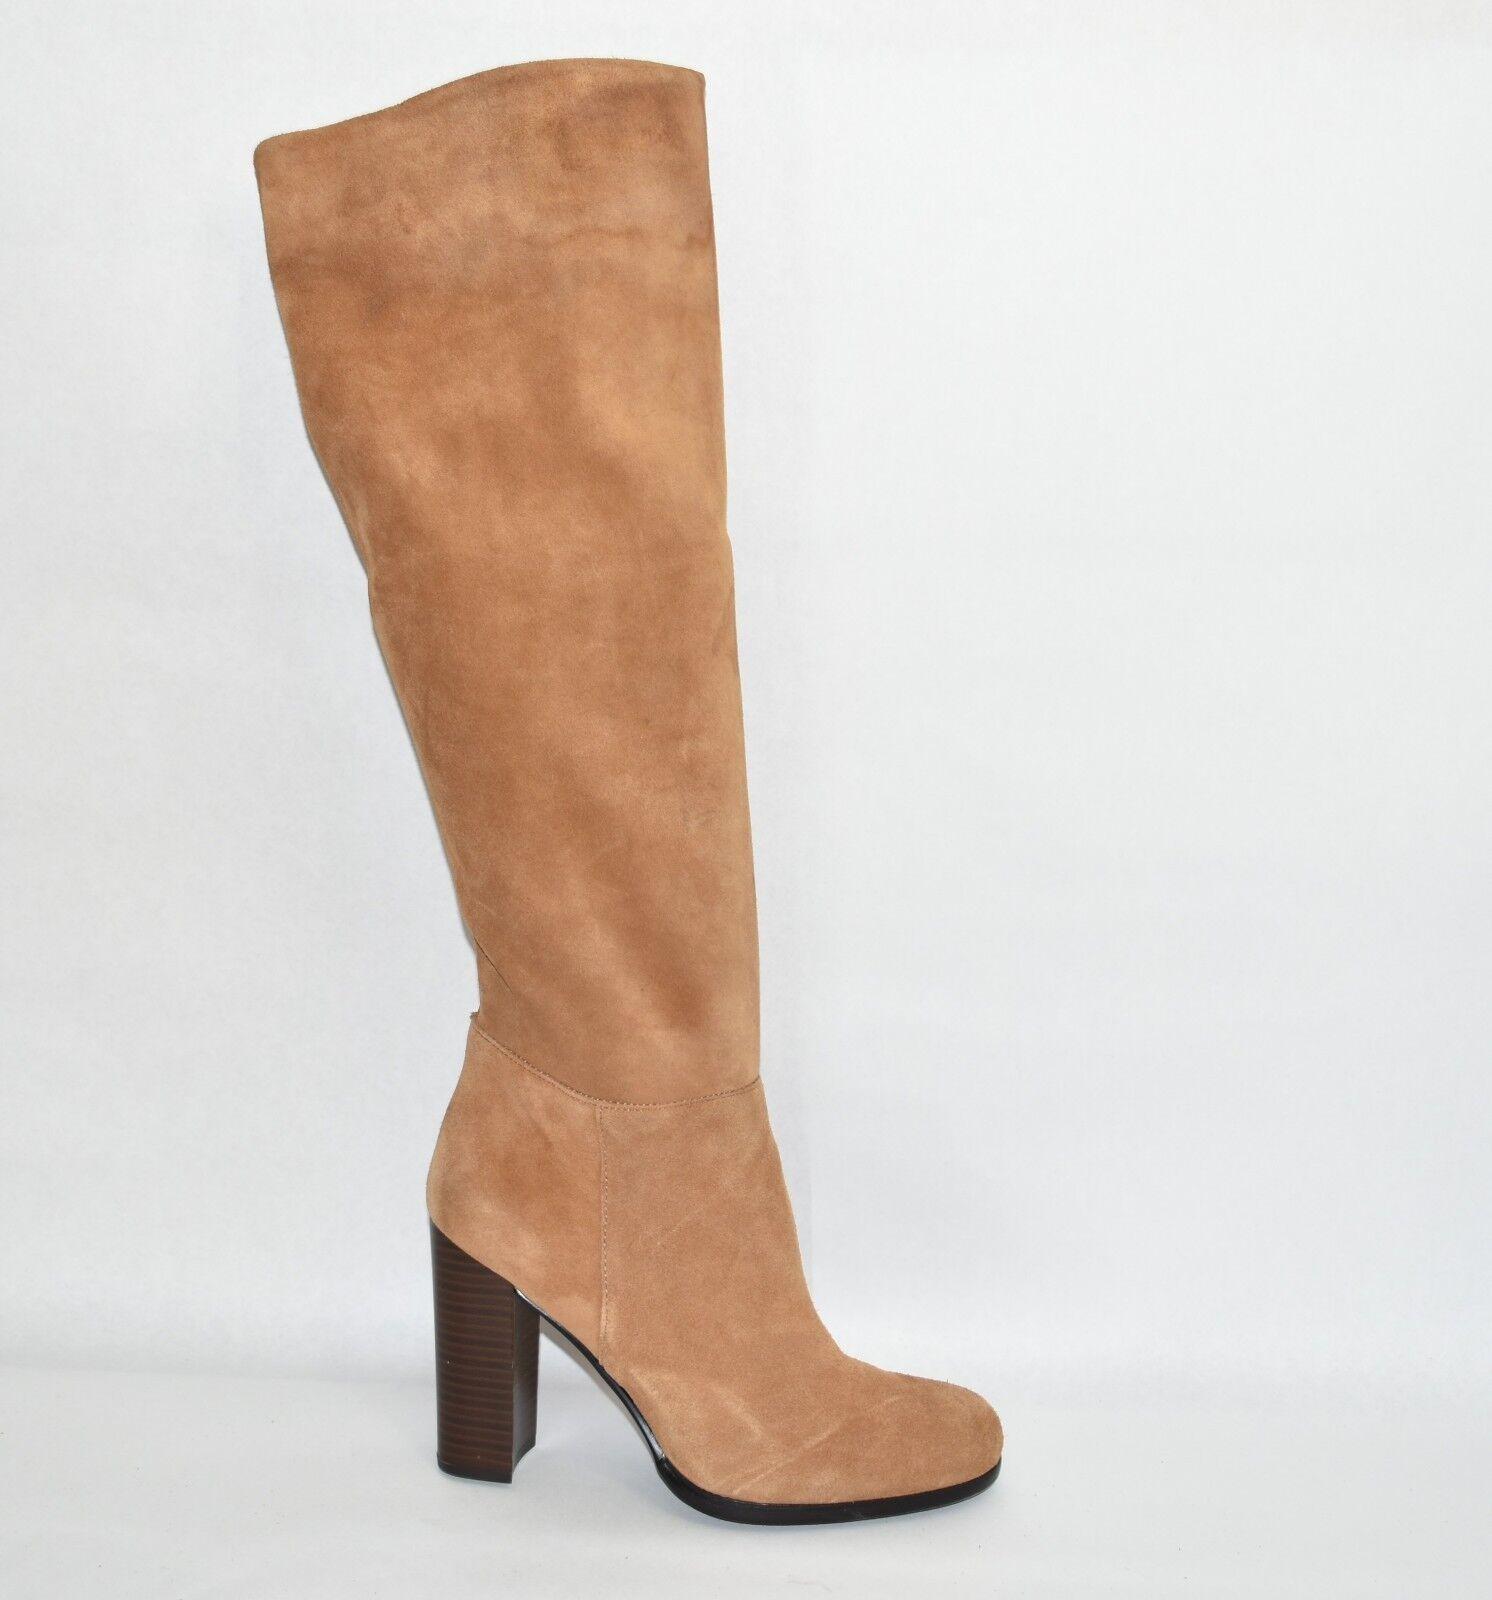 Sam Edelman Victoria Tall Suede Boot Golden Caramel Brown Size 10 T32